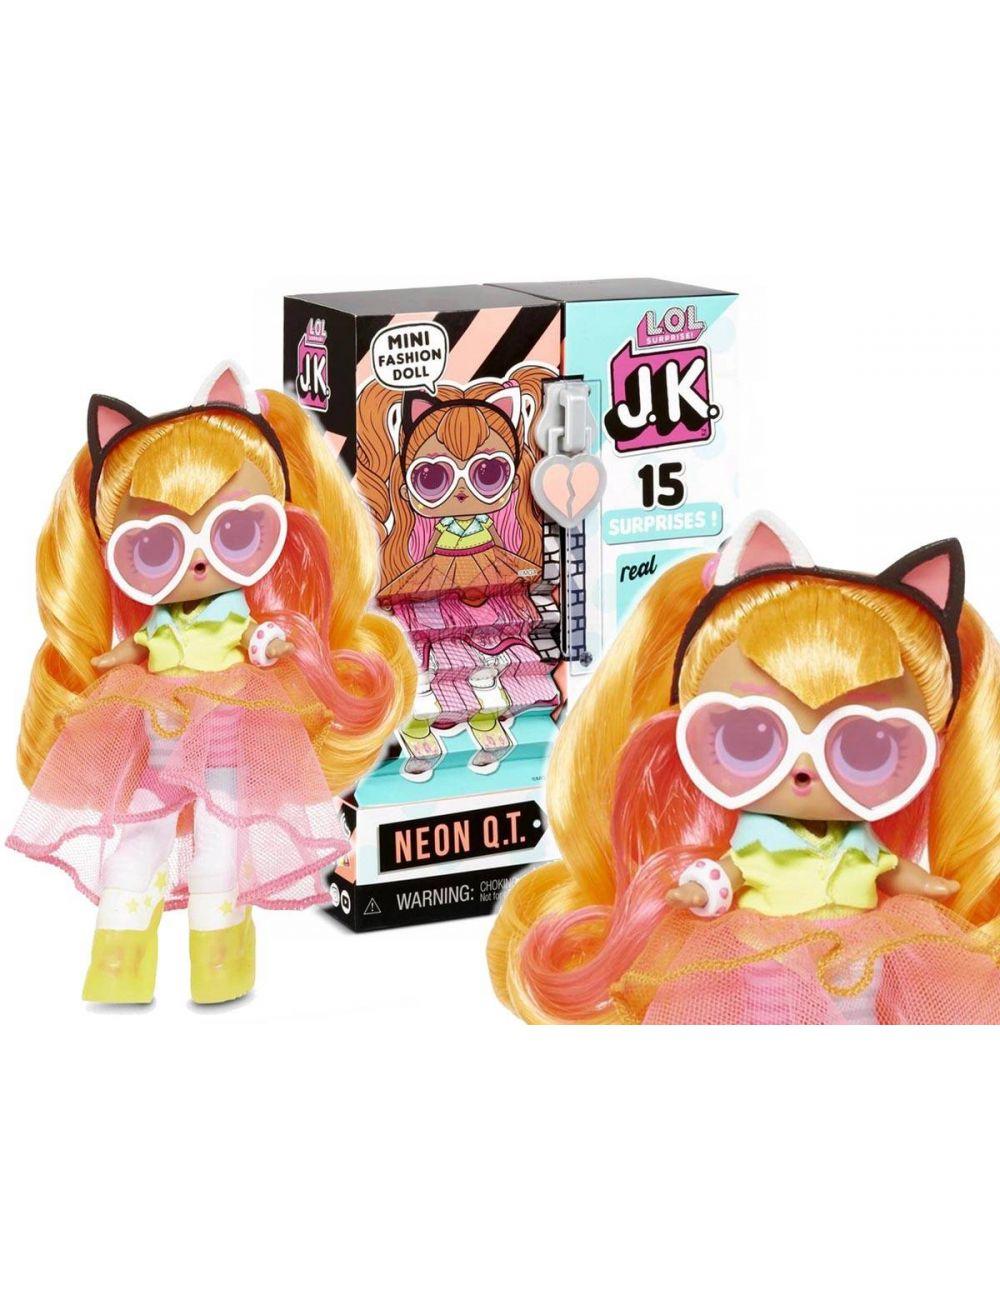 LOL Surprise J.K. Neon Q.T. lalka z butami na wysokich koturnach